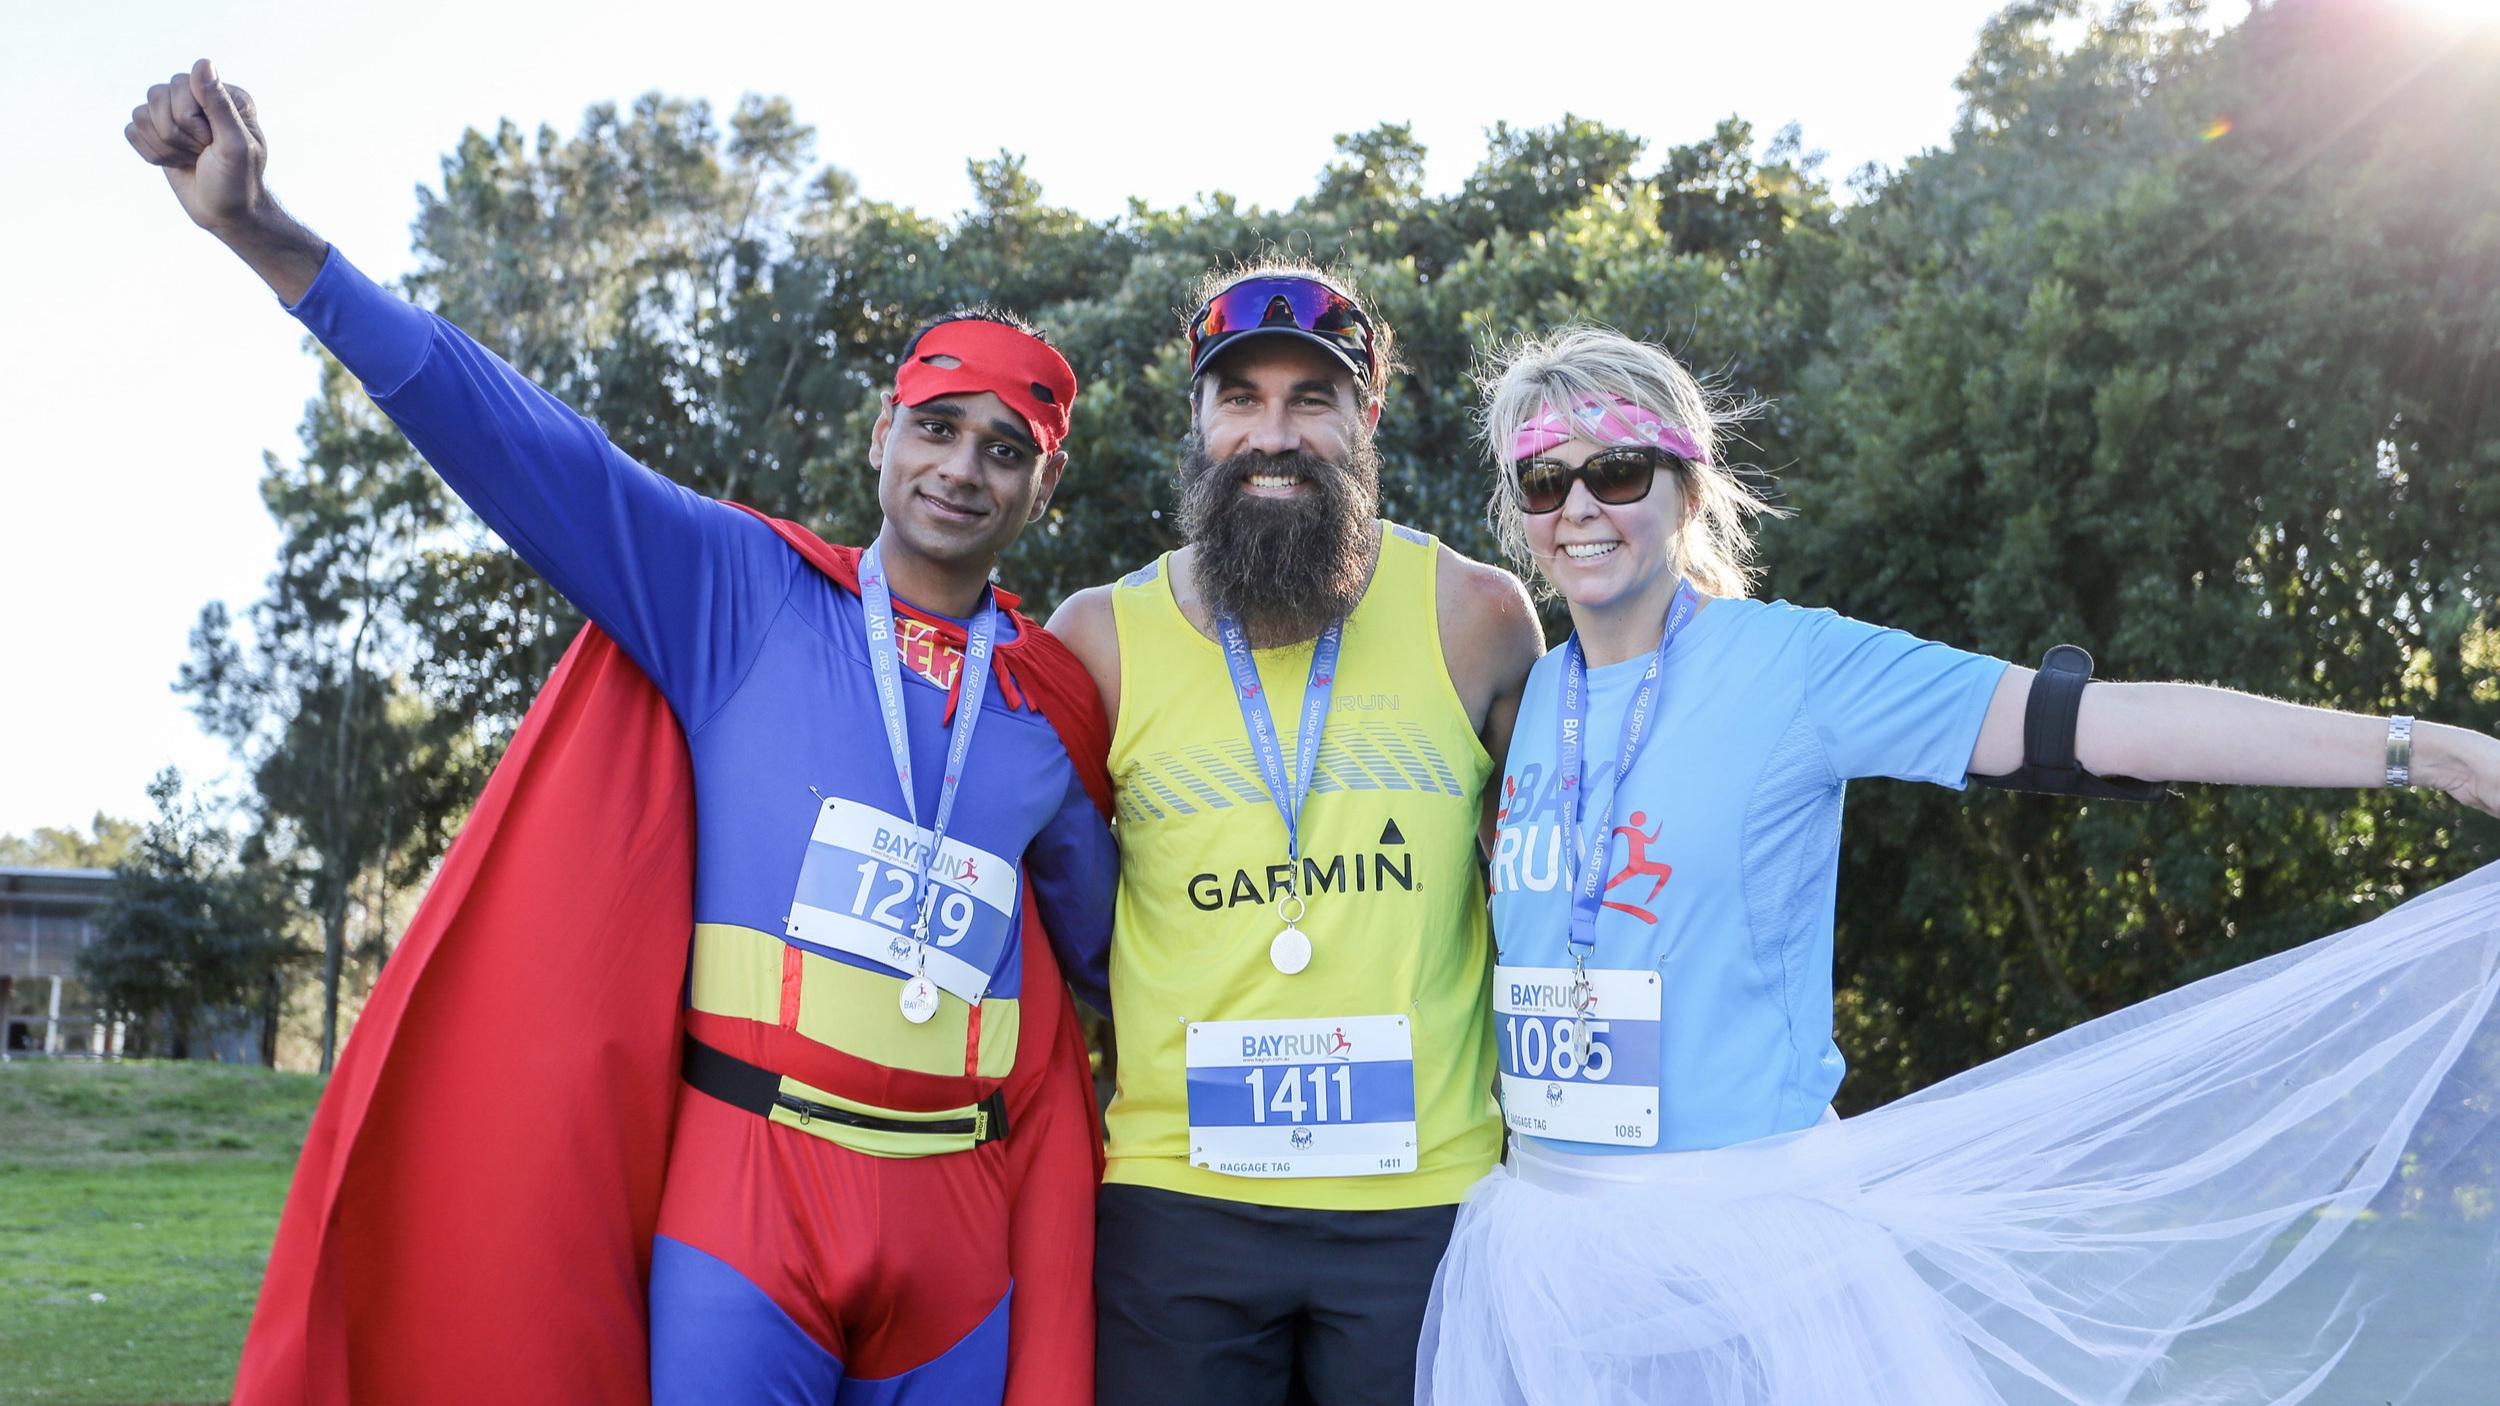 Best Costume Winners BayRun 2017 with the GARMIN Running MAN. Photo courtesy Rhys Logan